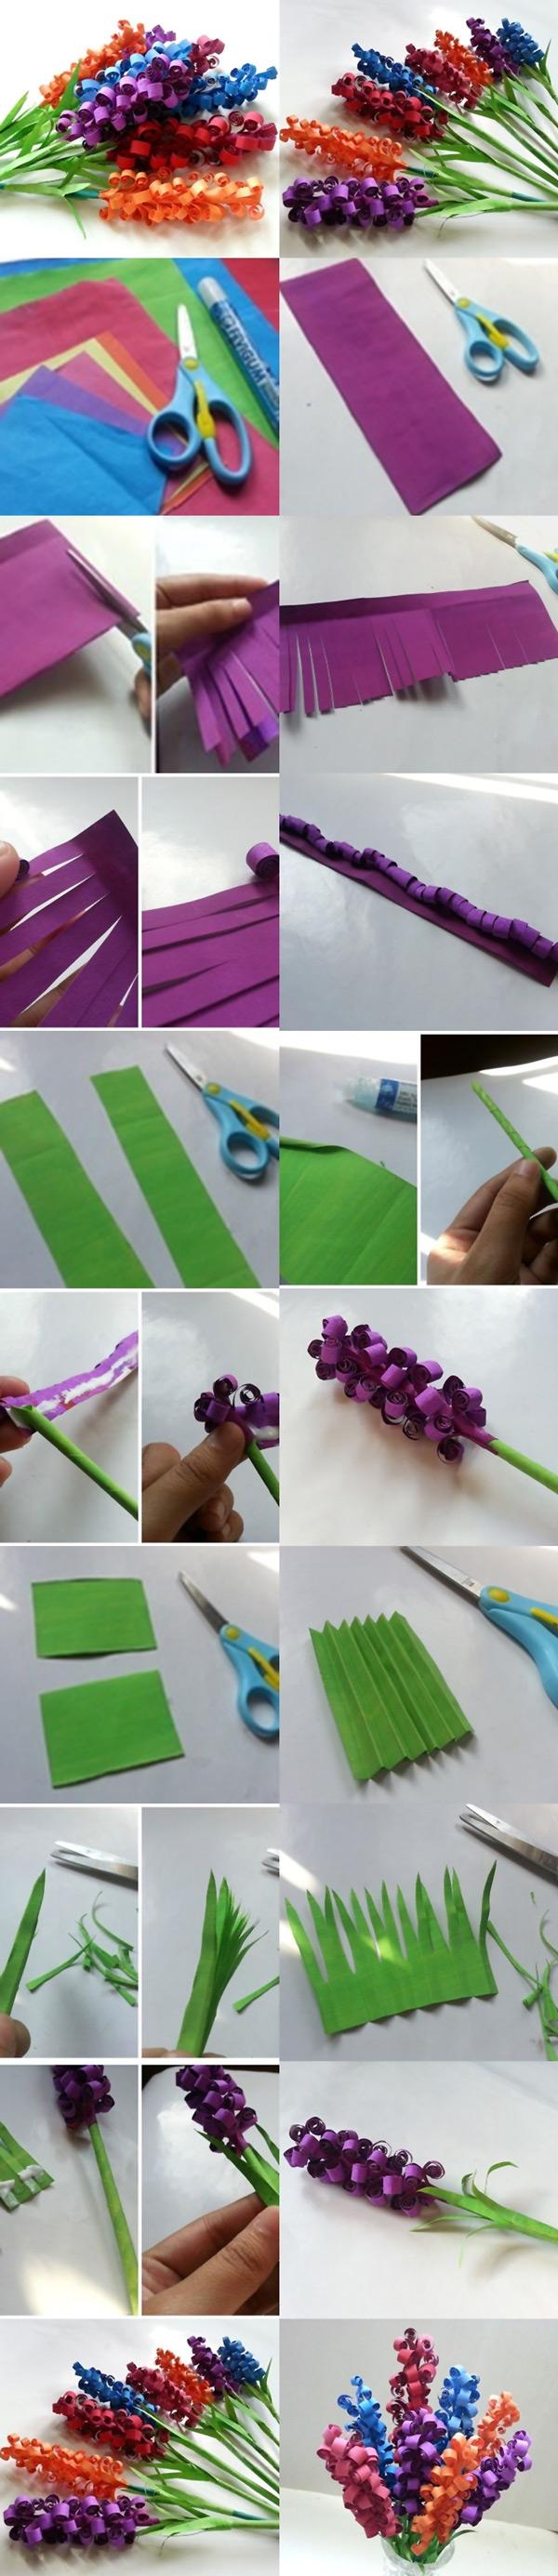 arranjo de flores de papel enrolado